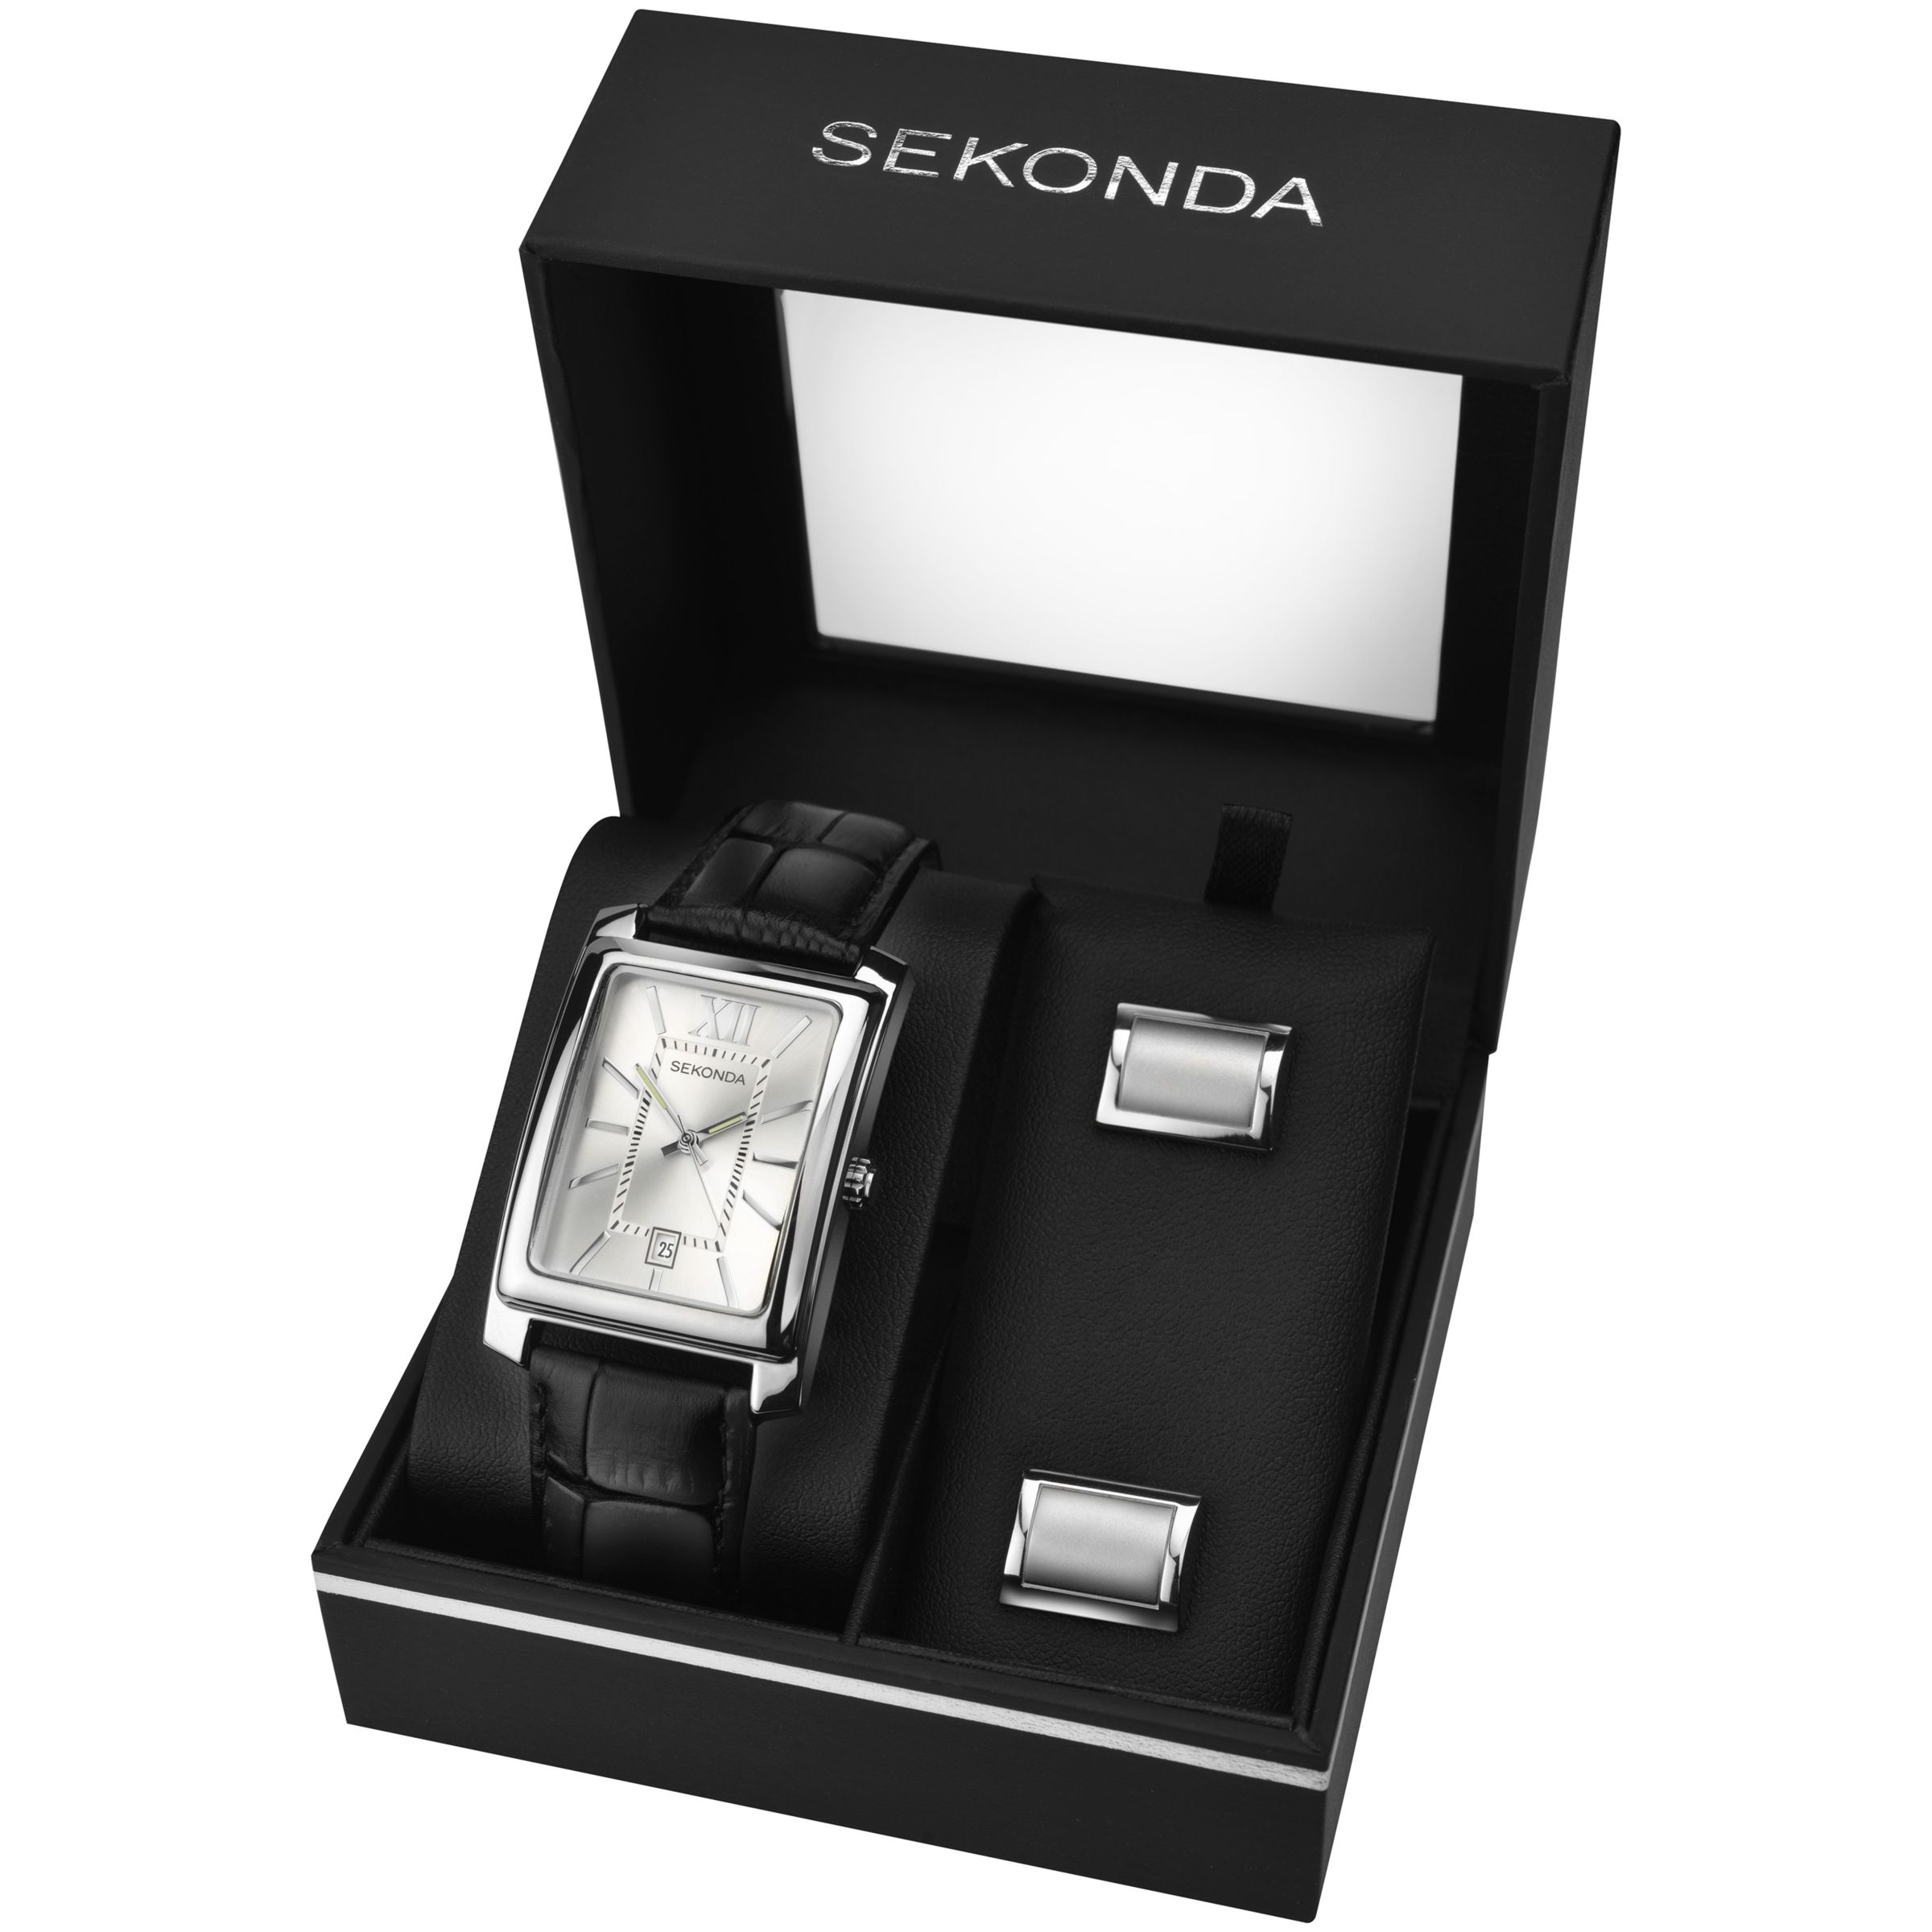 Sekonda Sekonda 3801G Men's Rectangular Leather Strap Watch and Cufflinks Gift Set, Black/Silver